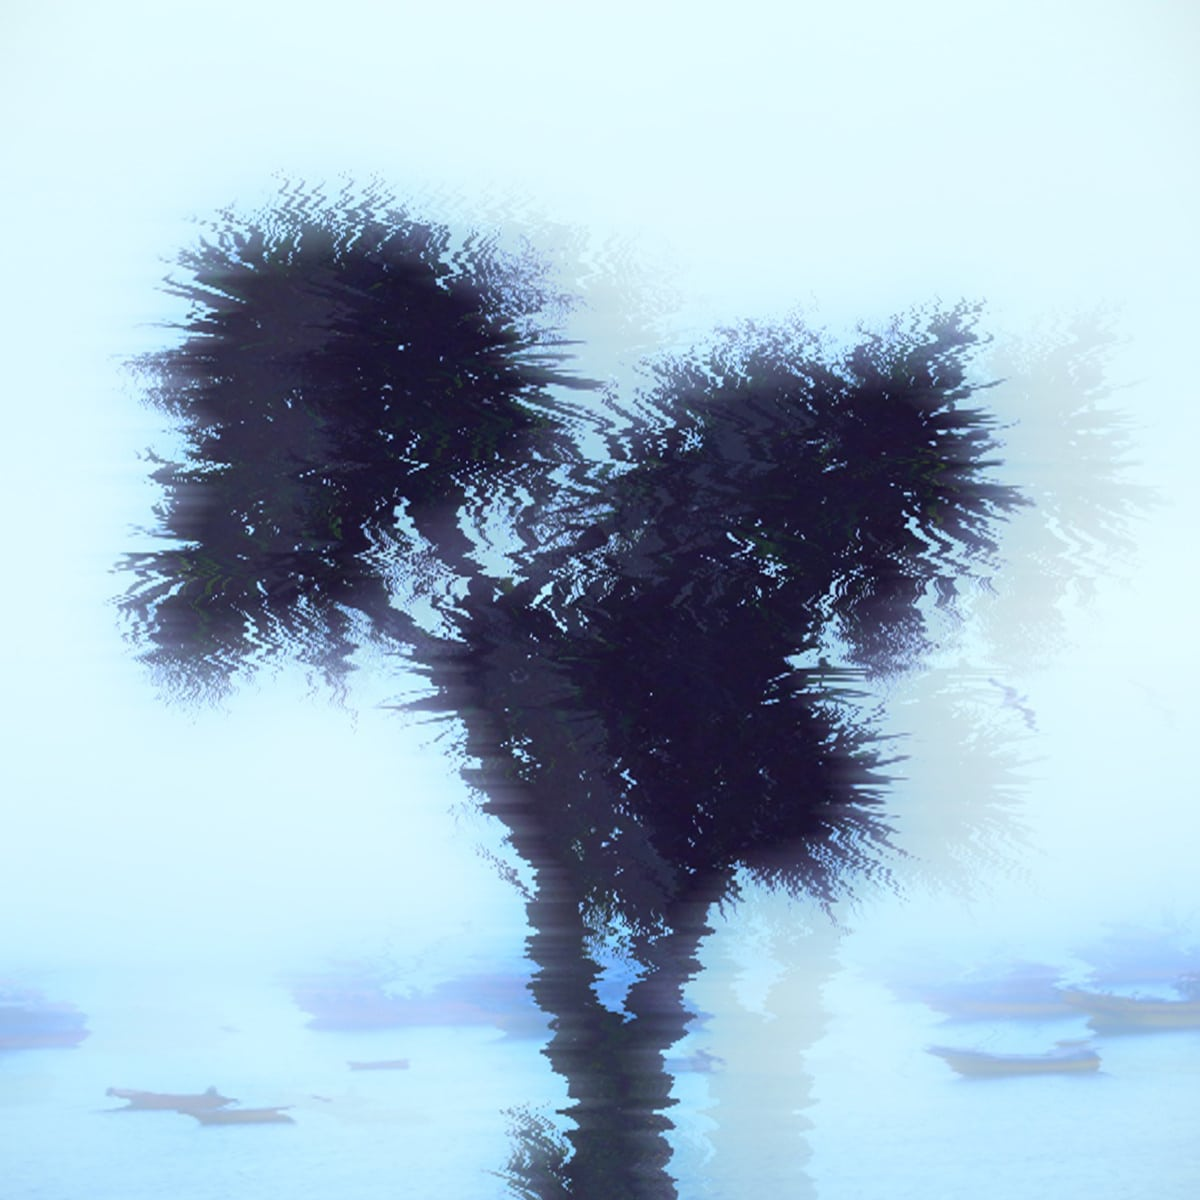 Ghost McGrady - The Daybreak EP - 2015